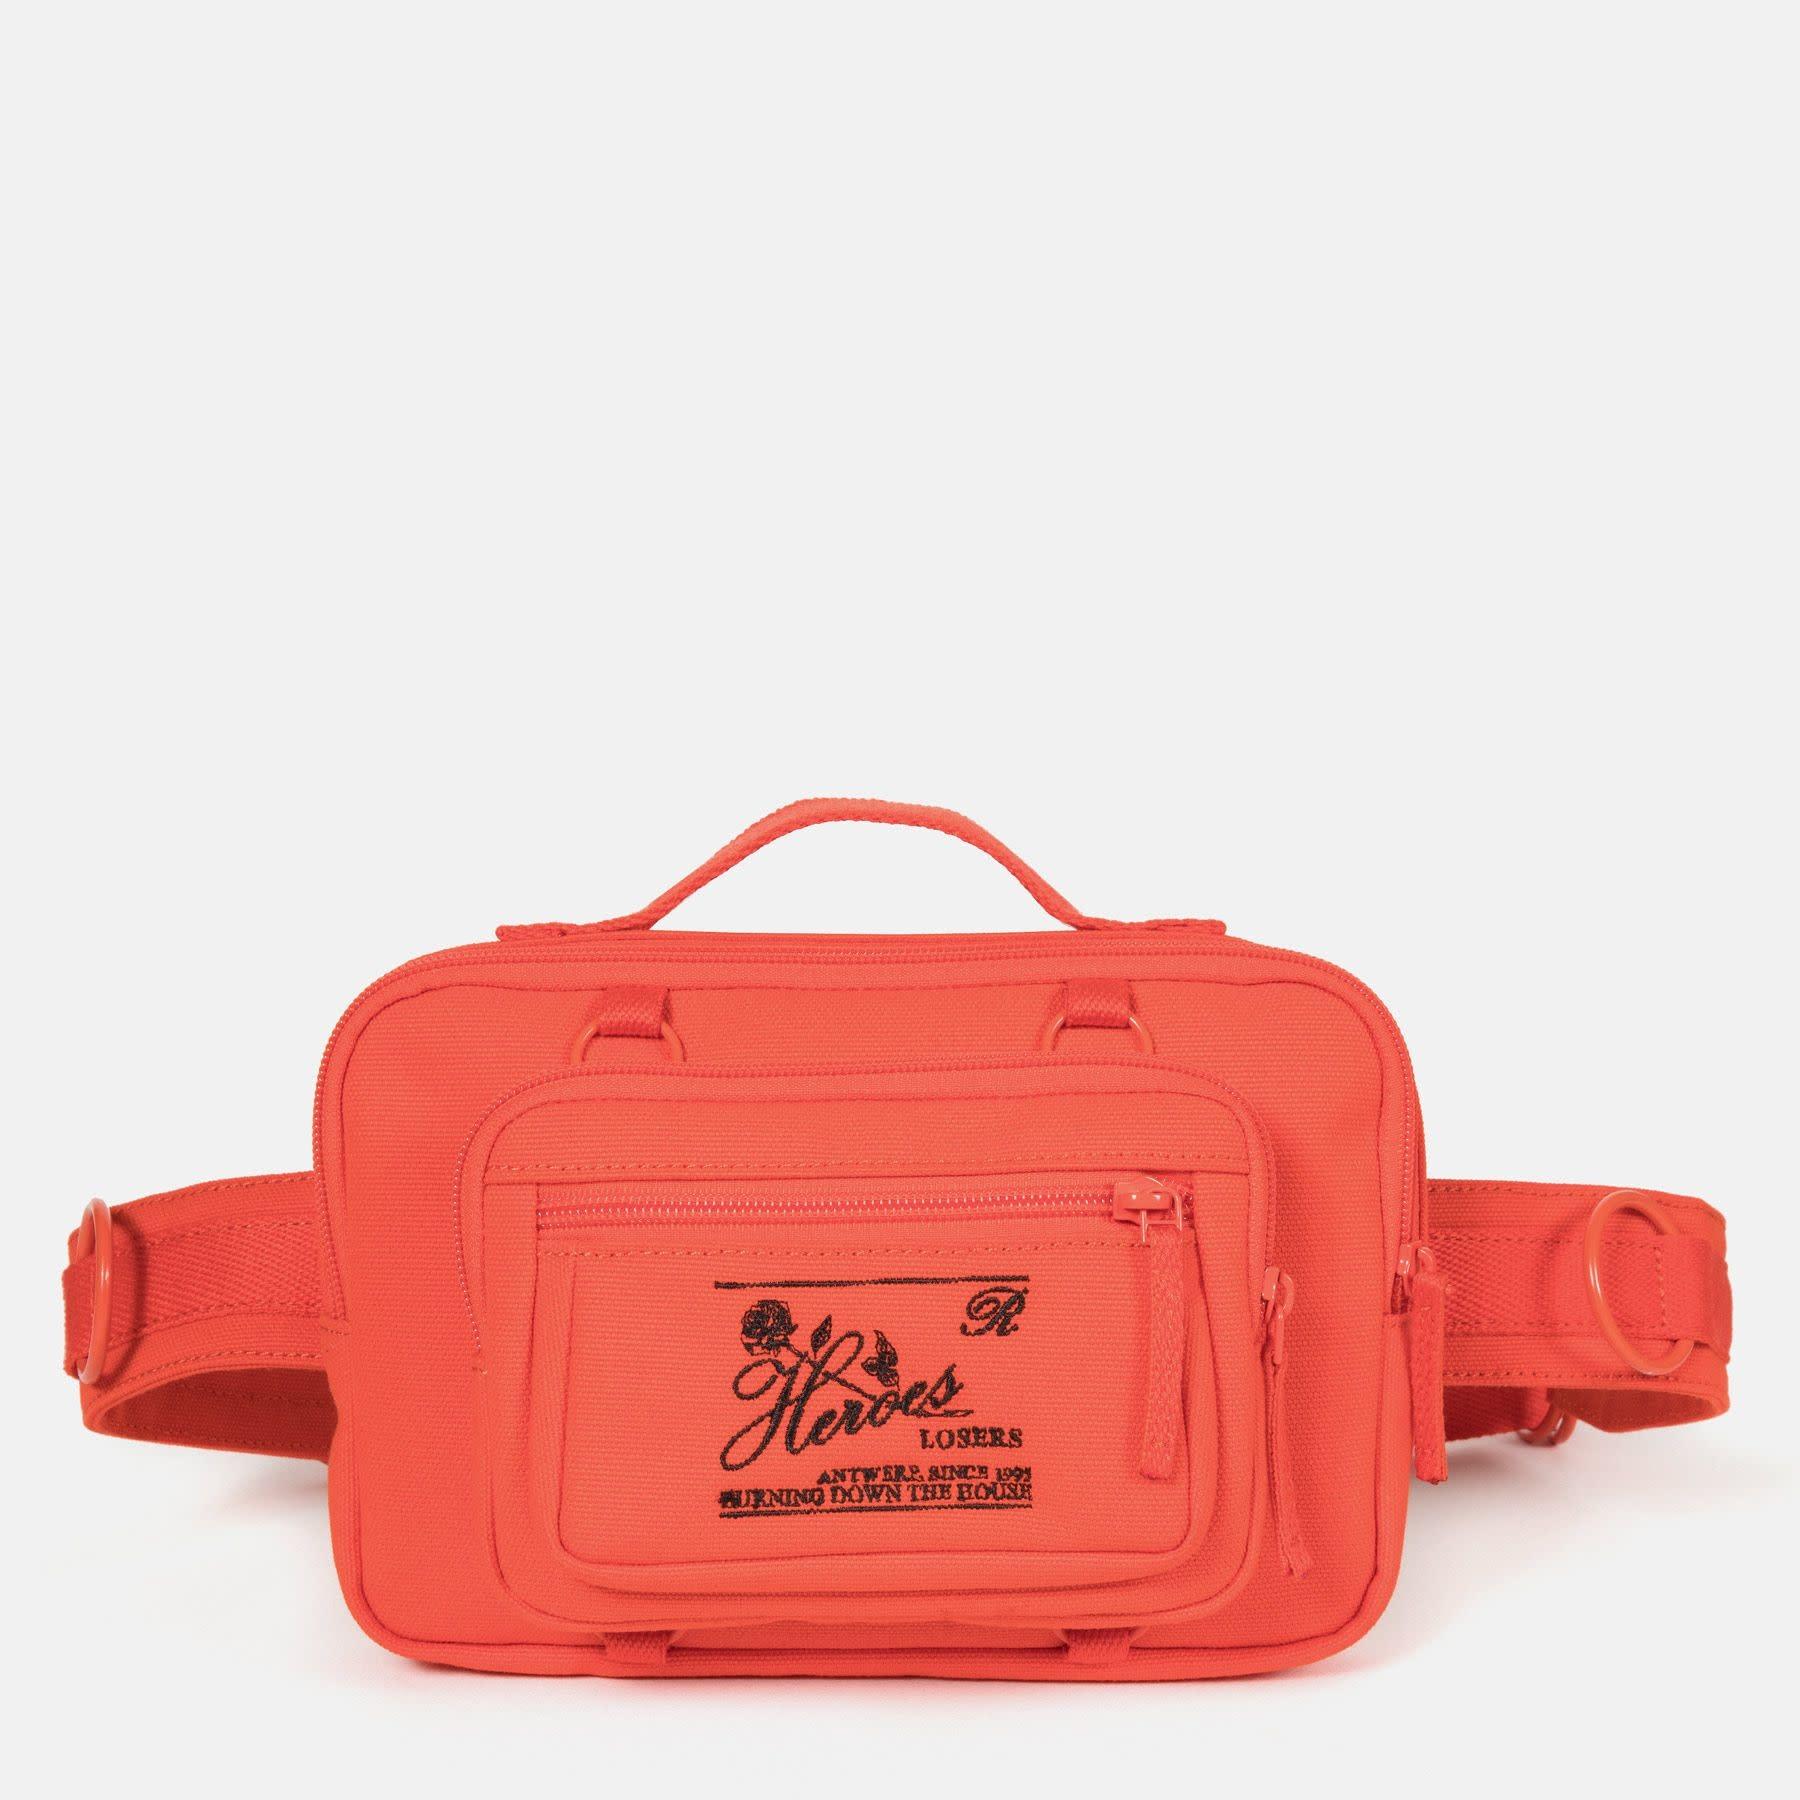 RAF SIMONS Raf Simons X Eastpak Loop Waist Bag in Safety Orange